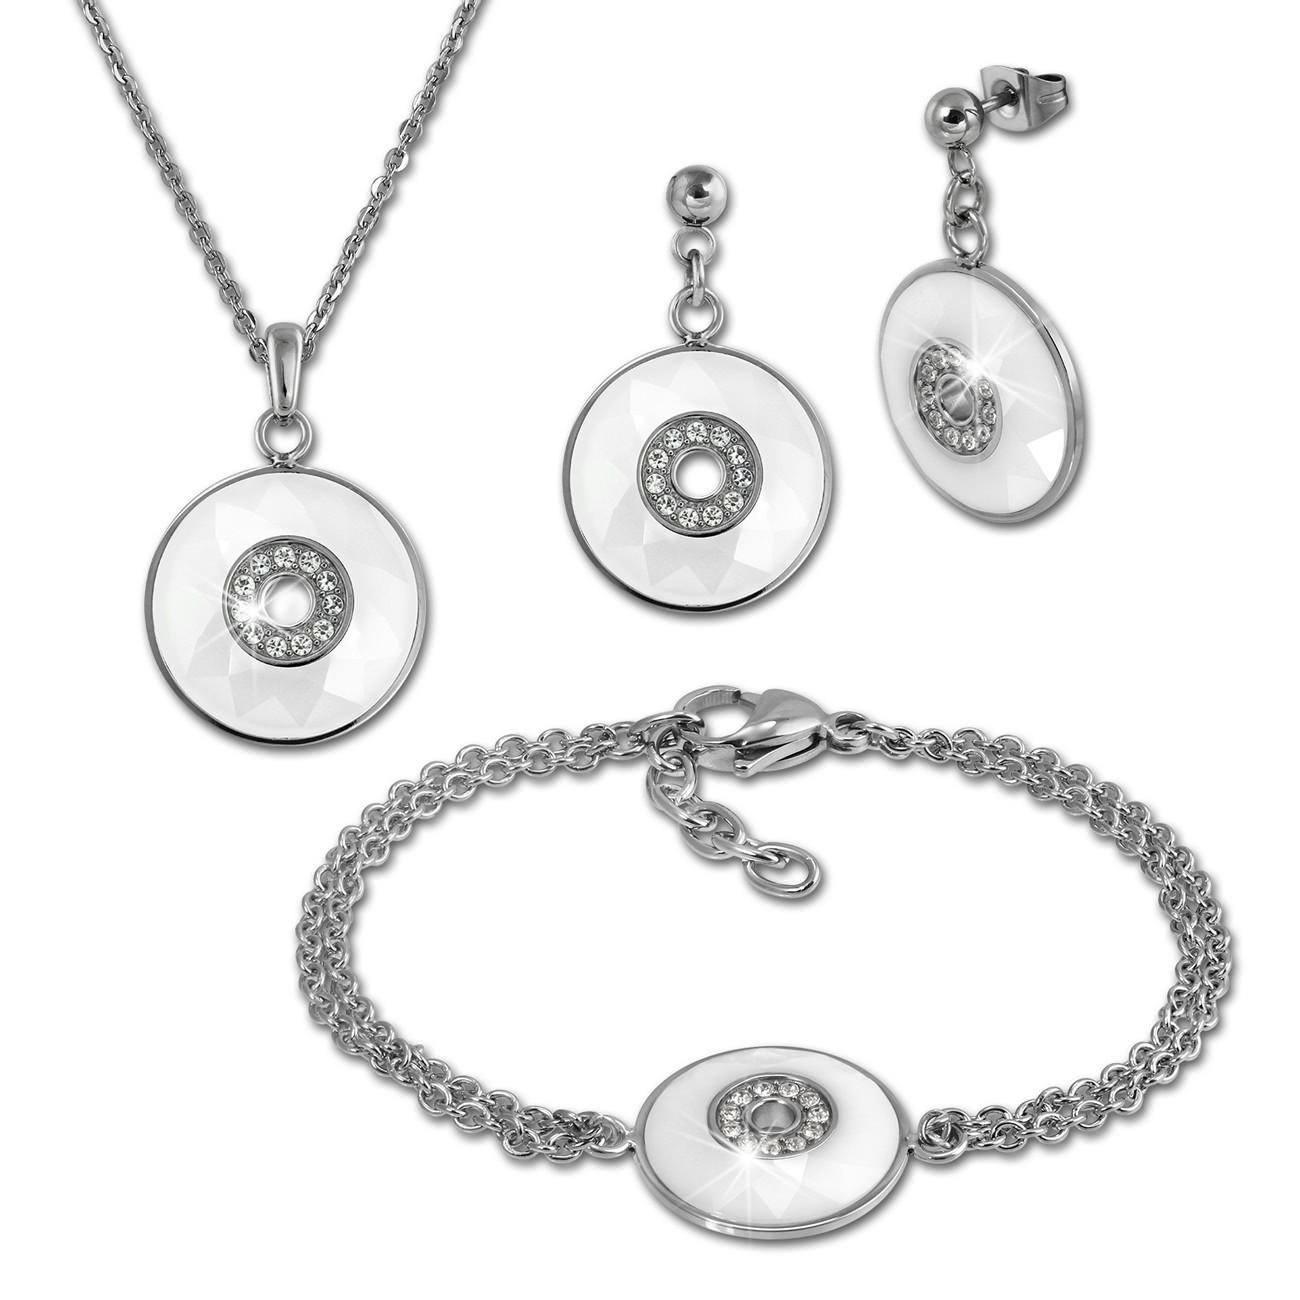 Amello Edelstahlschmuckset Keramik Rund Zirkonia Kette, Armband, Ohrring ESSX29W